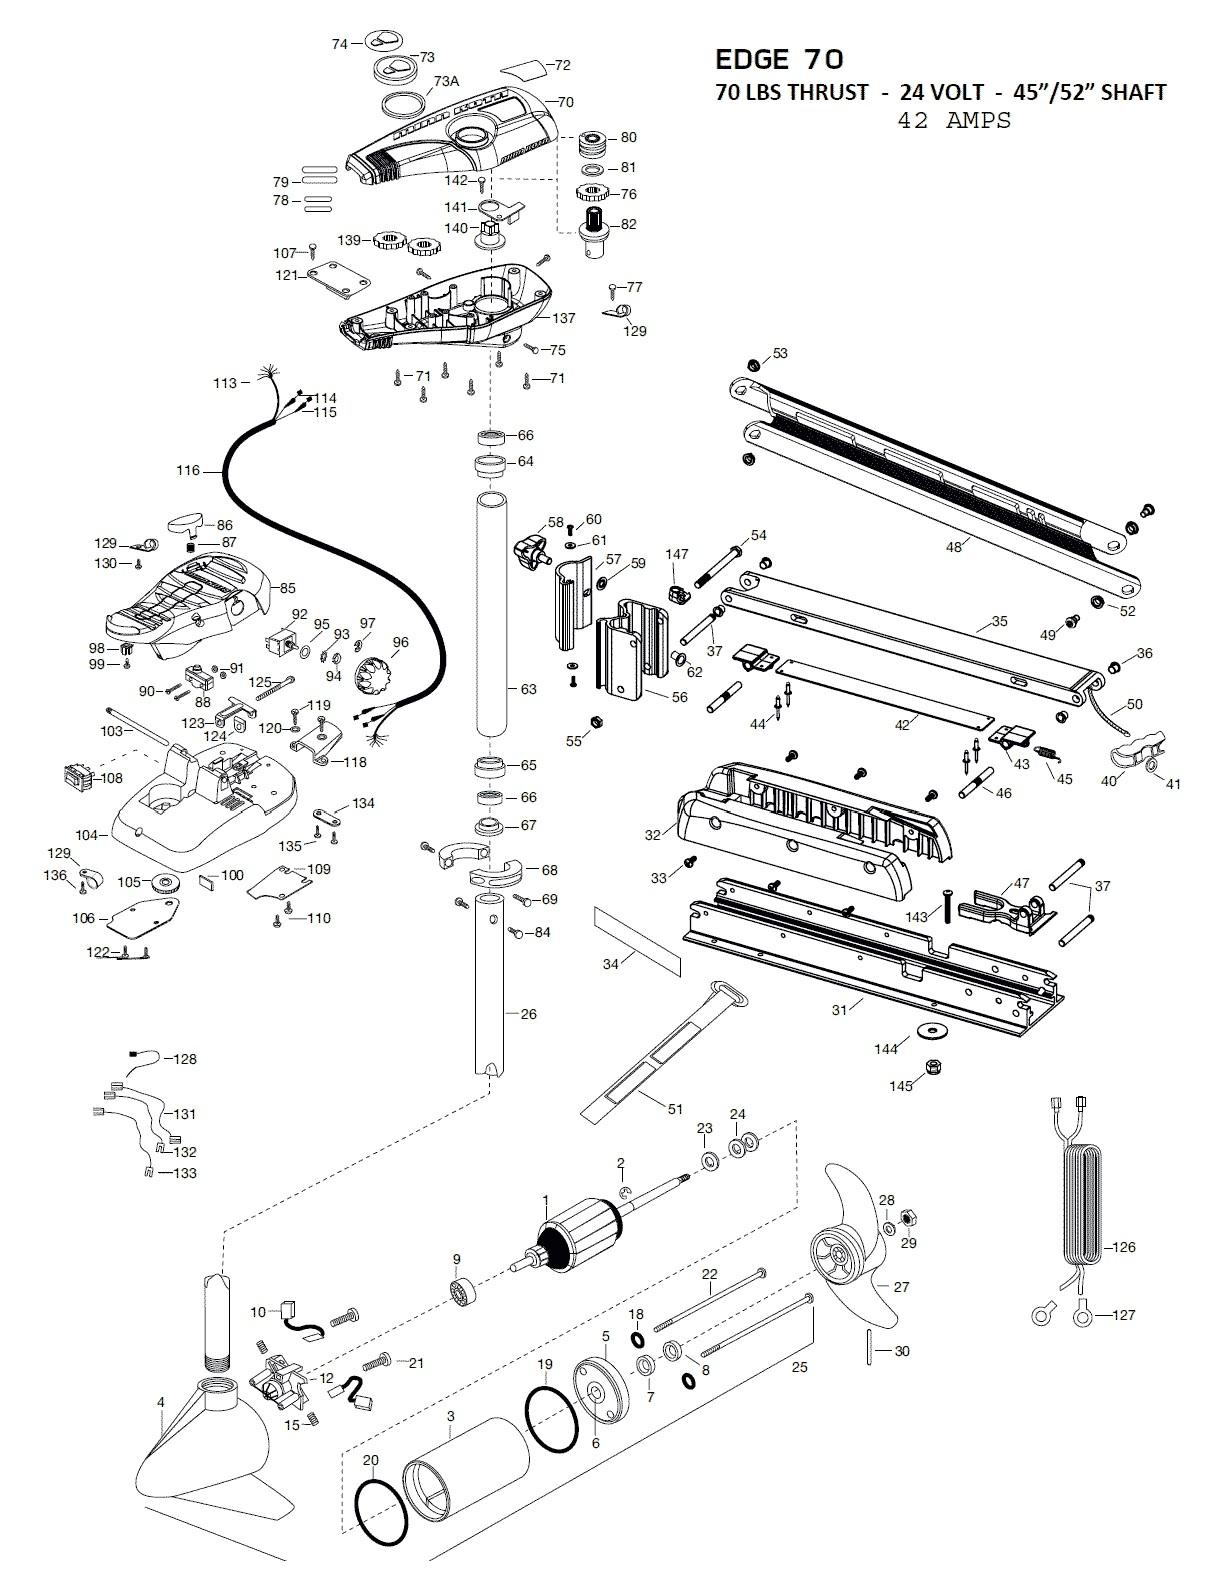 minn kota wiring diagram manual Collection-View Full Size Diagram 5-p